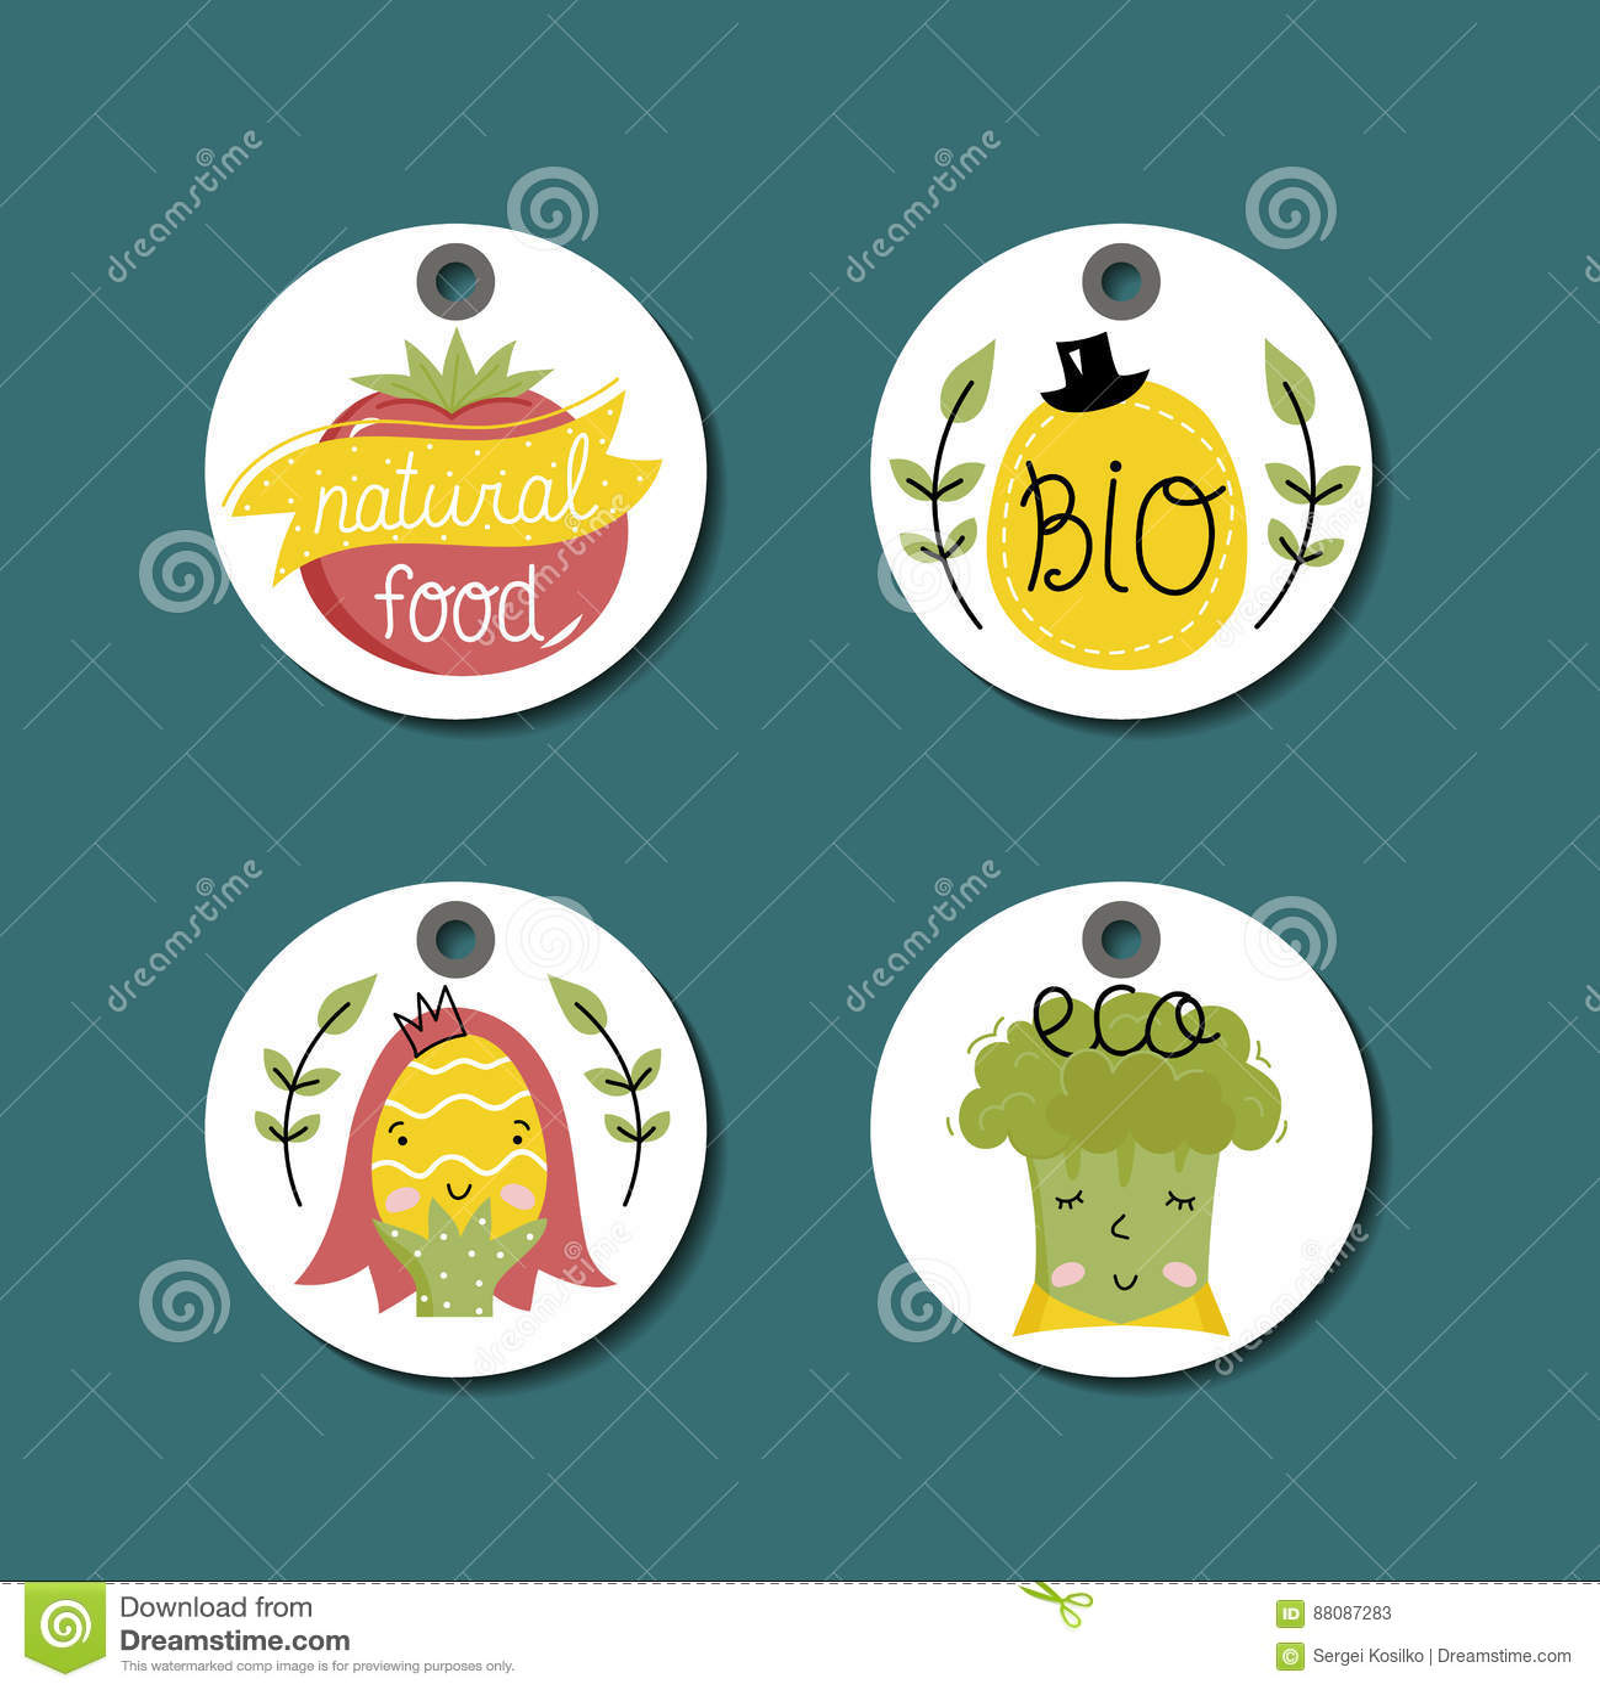 Background Description In Natural Foods